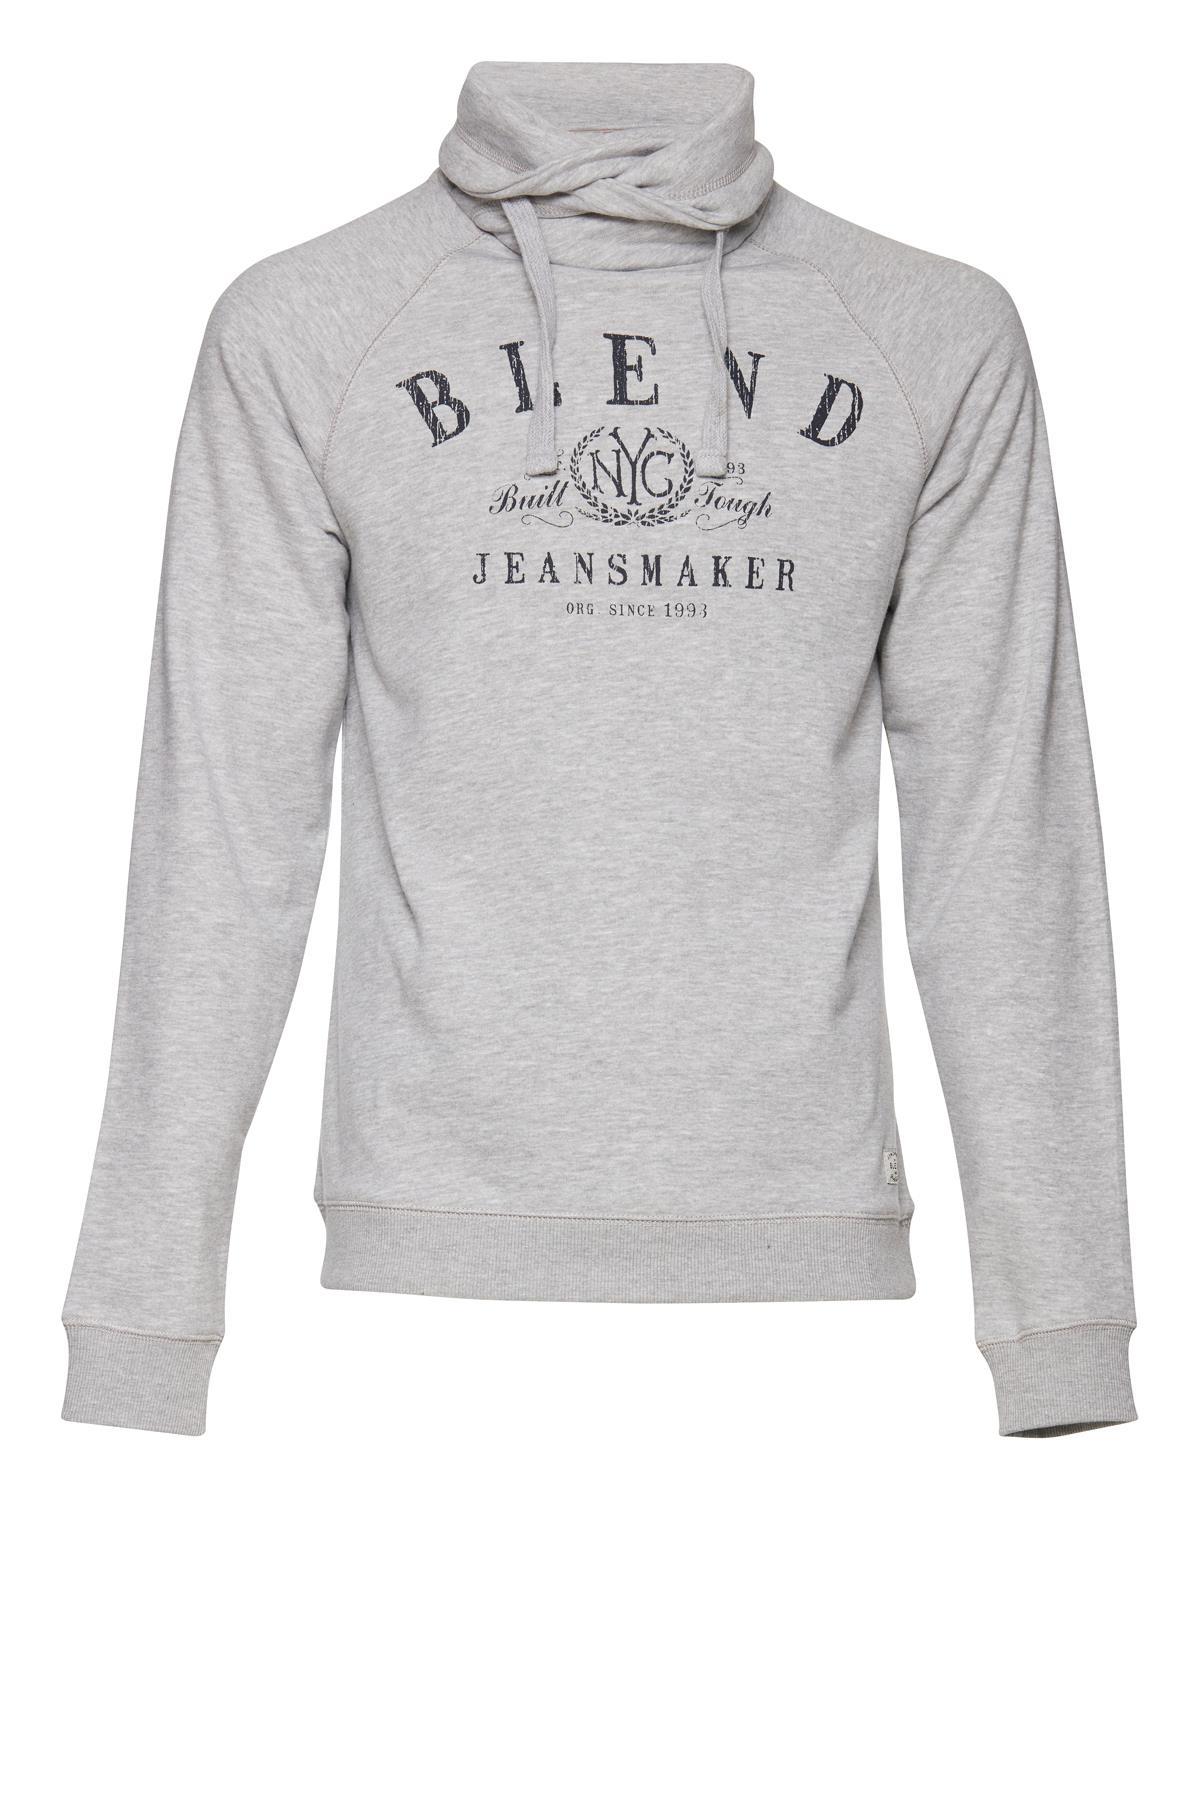 Gråmeleret Sweatshirt – Køb Gråmeleret Sweatshirt fra str. S-XL her